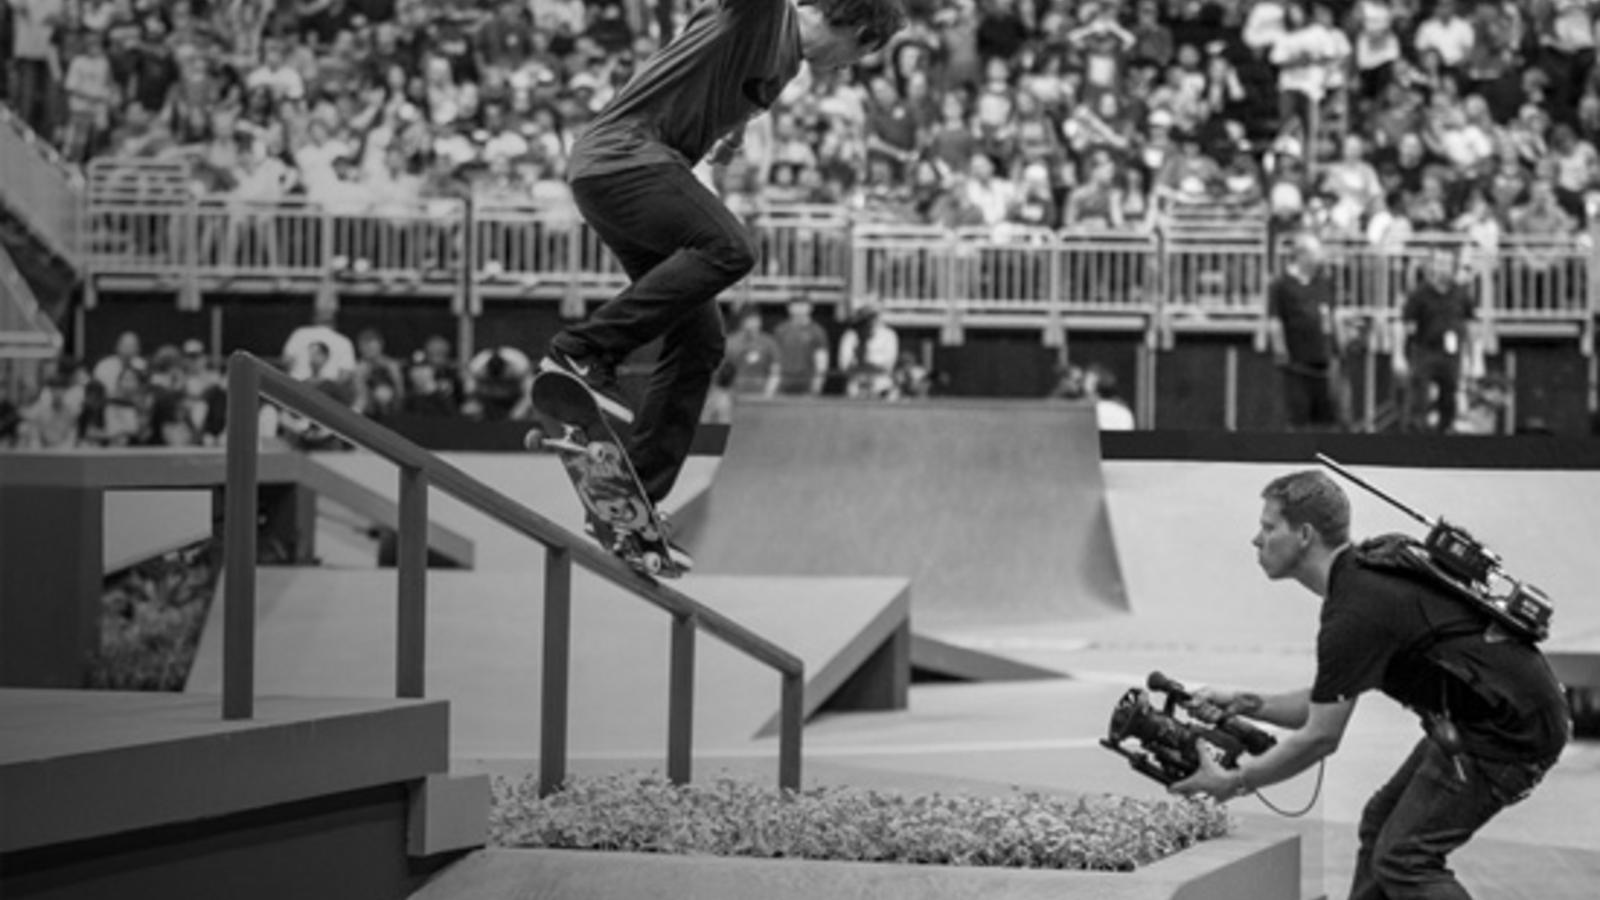 Street League Skateboarding Announces 2013 Nike SB World